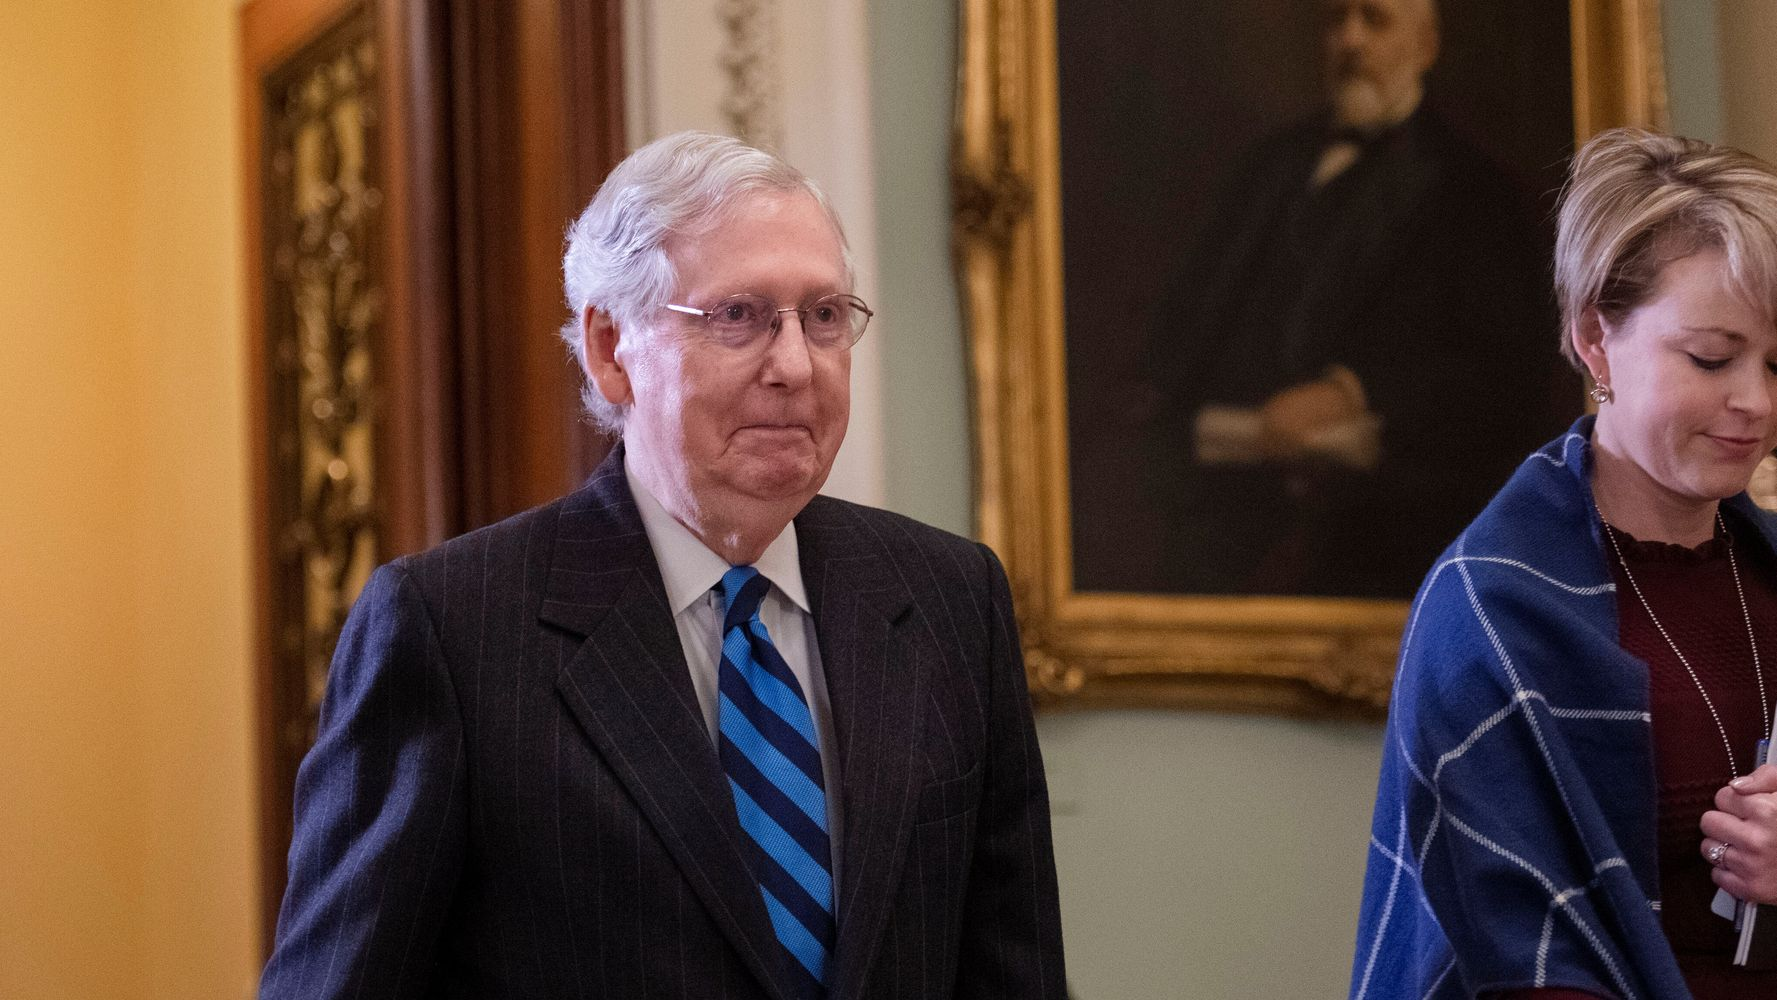 Westlake Legal Group 5e34cbd0220000520023d630 Senate Sets The Stage For Trump's Acquittal Next Week